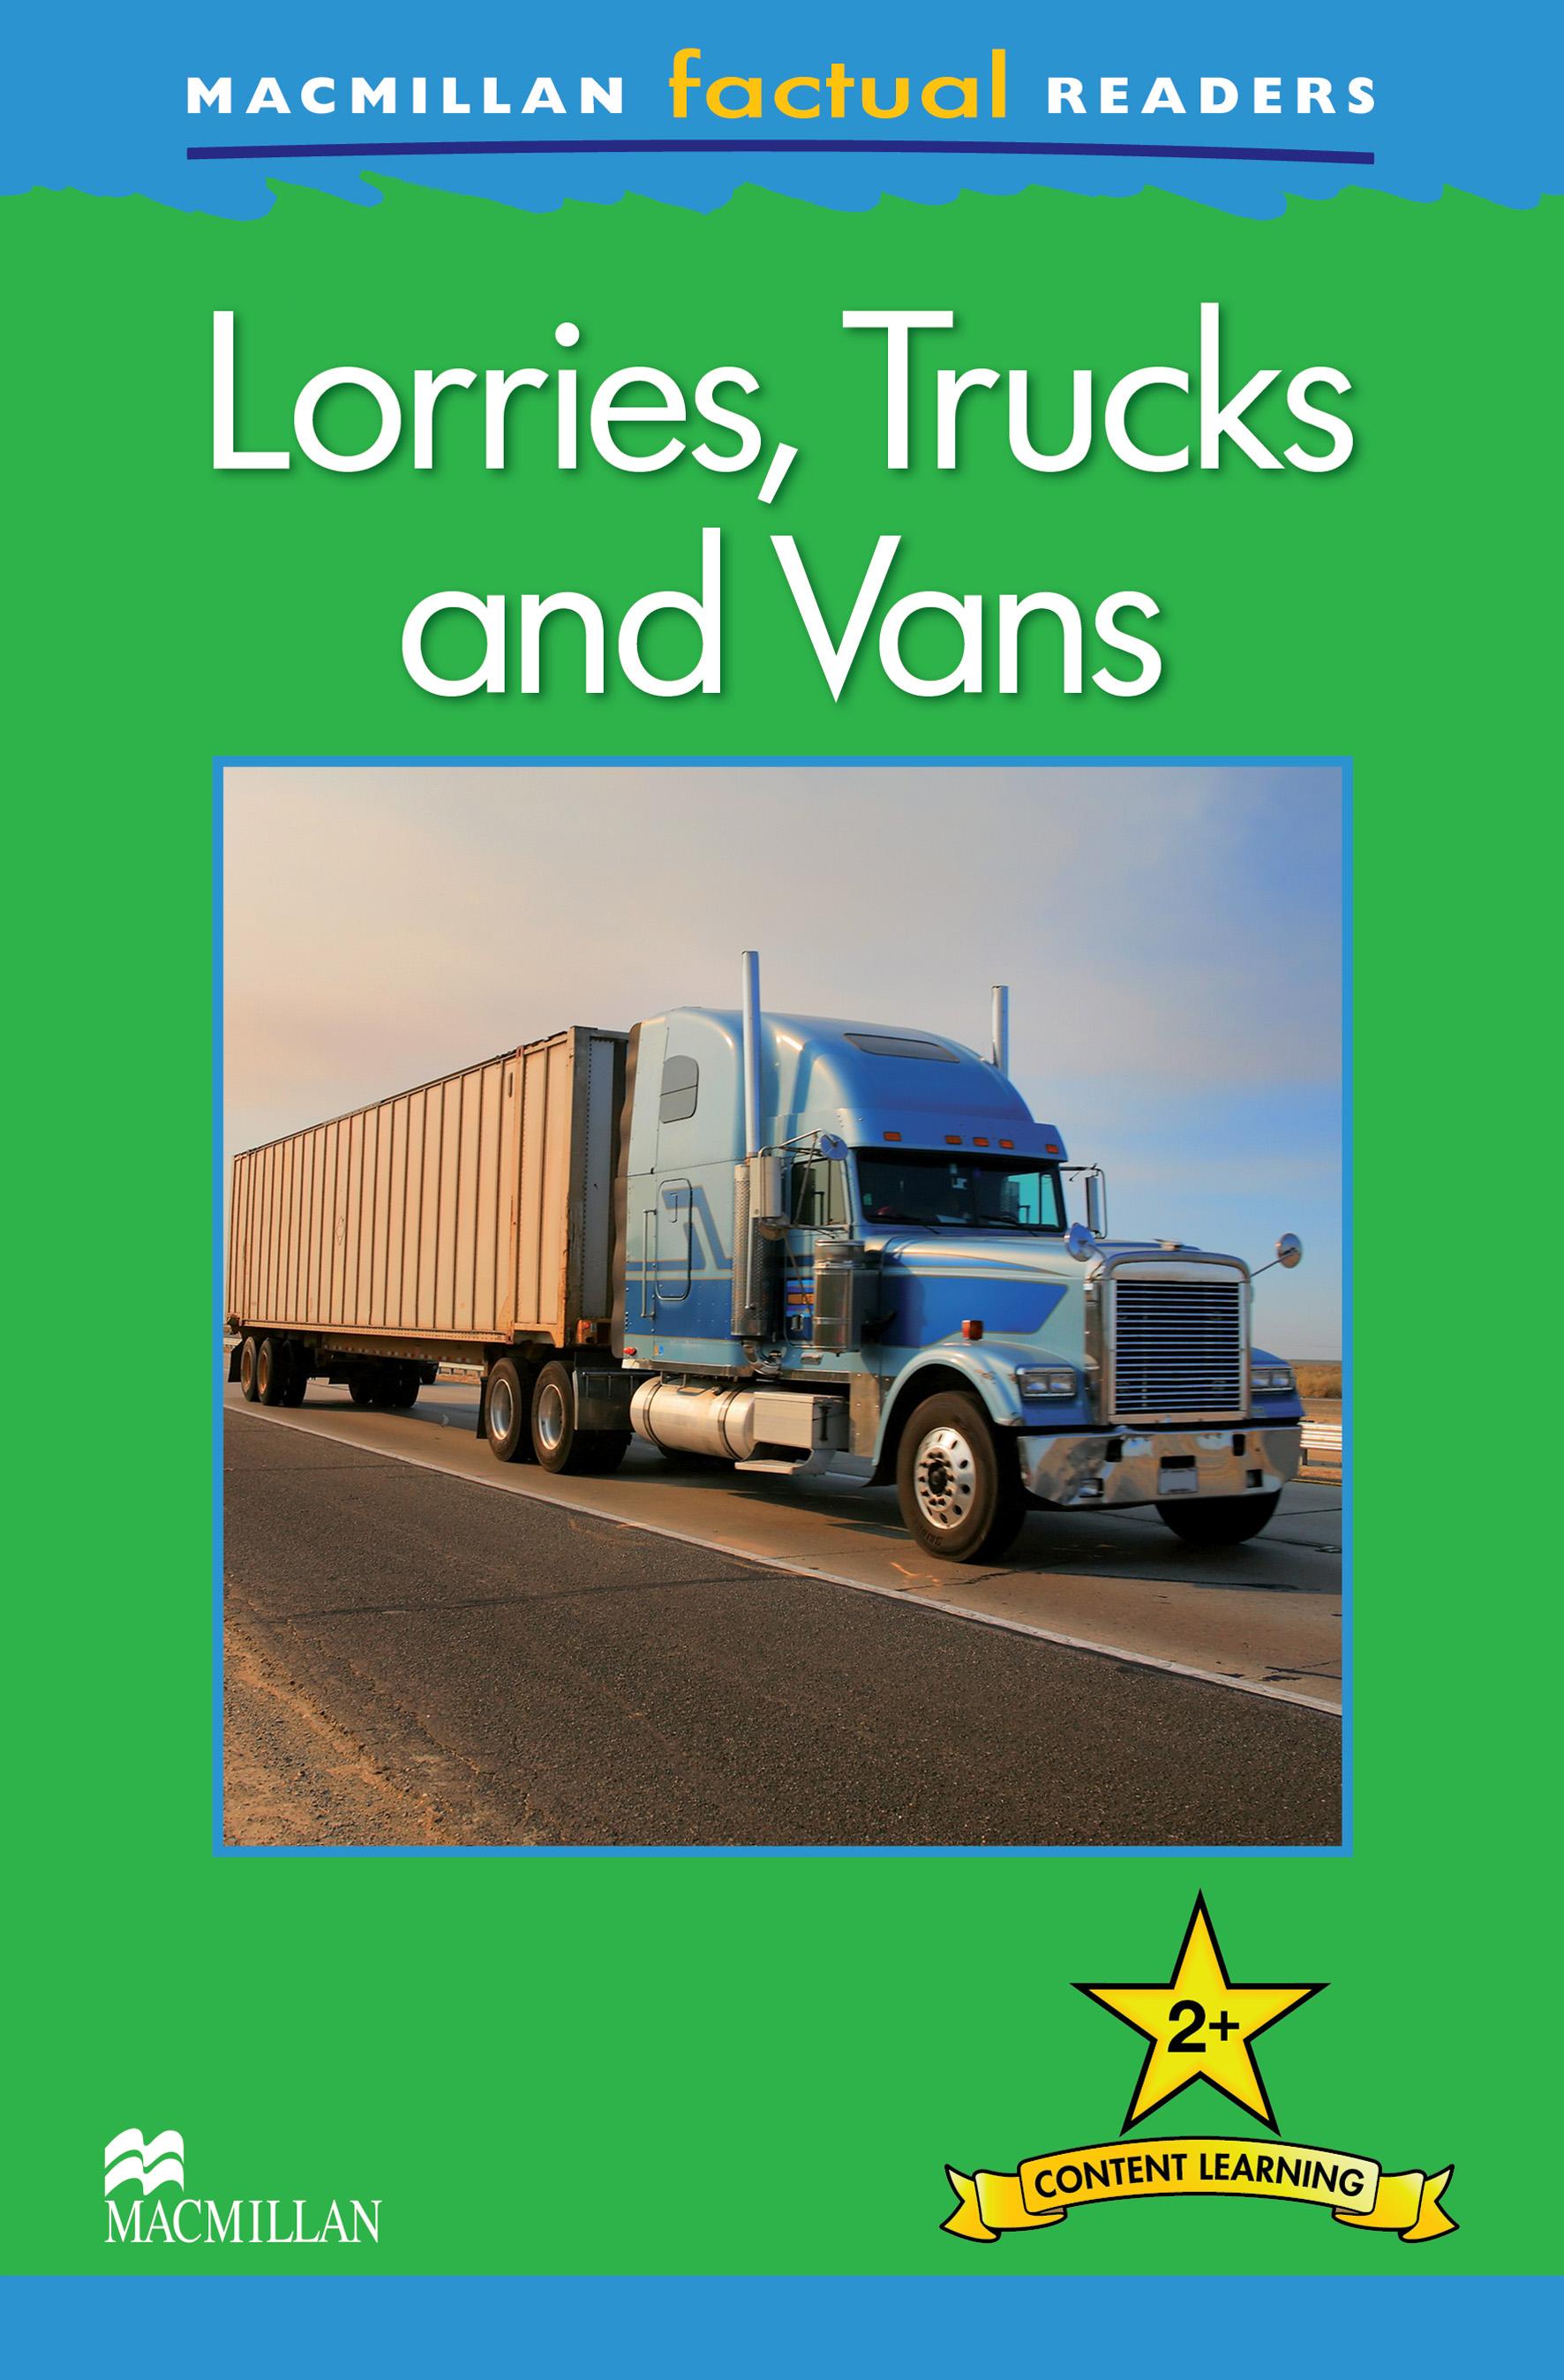 Macmillan Factual Readers: Lorries, Trucks and Vans